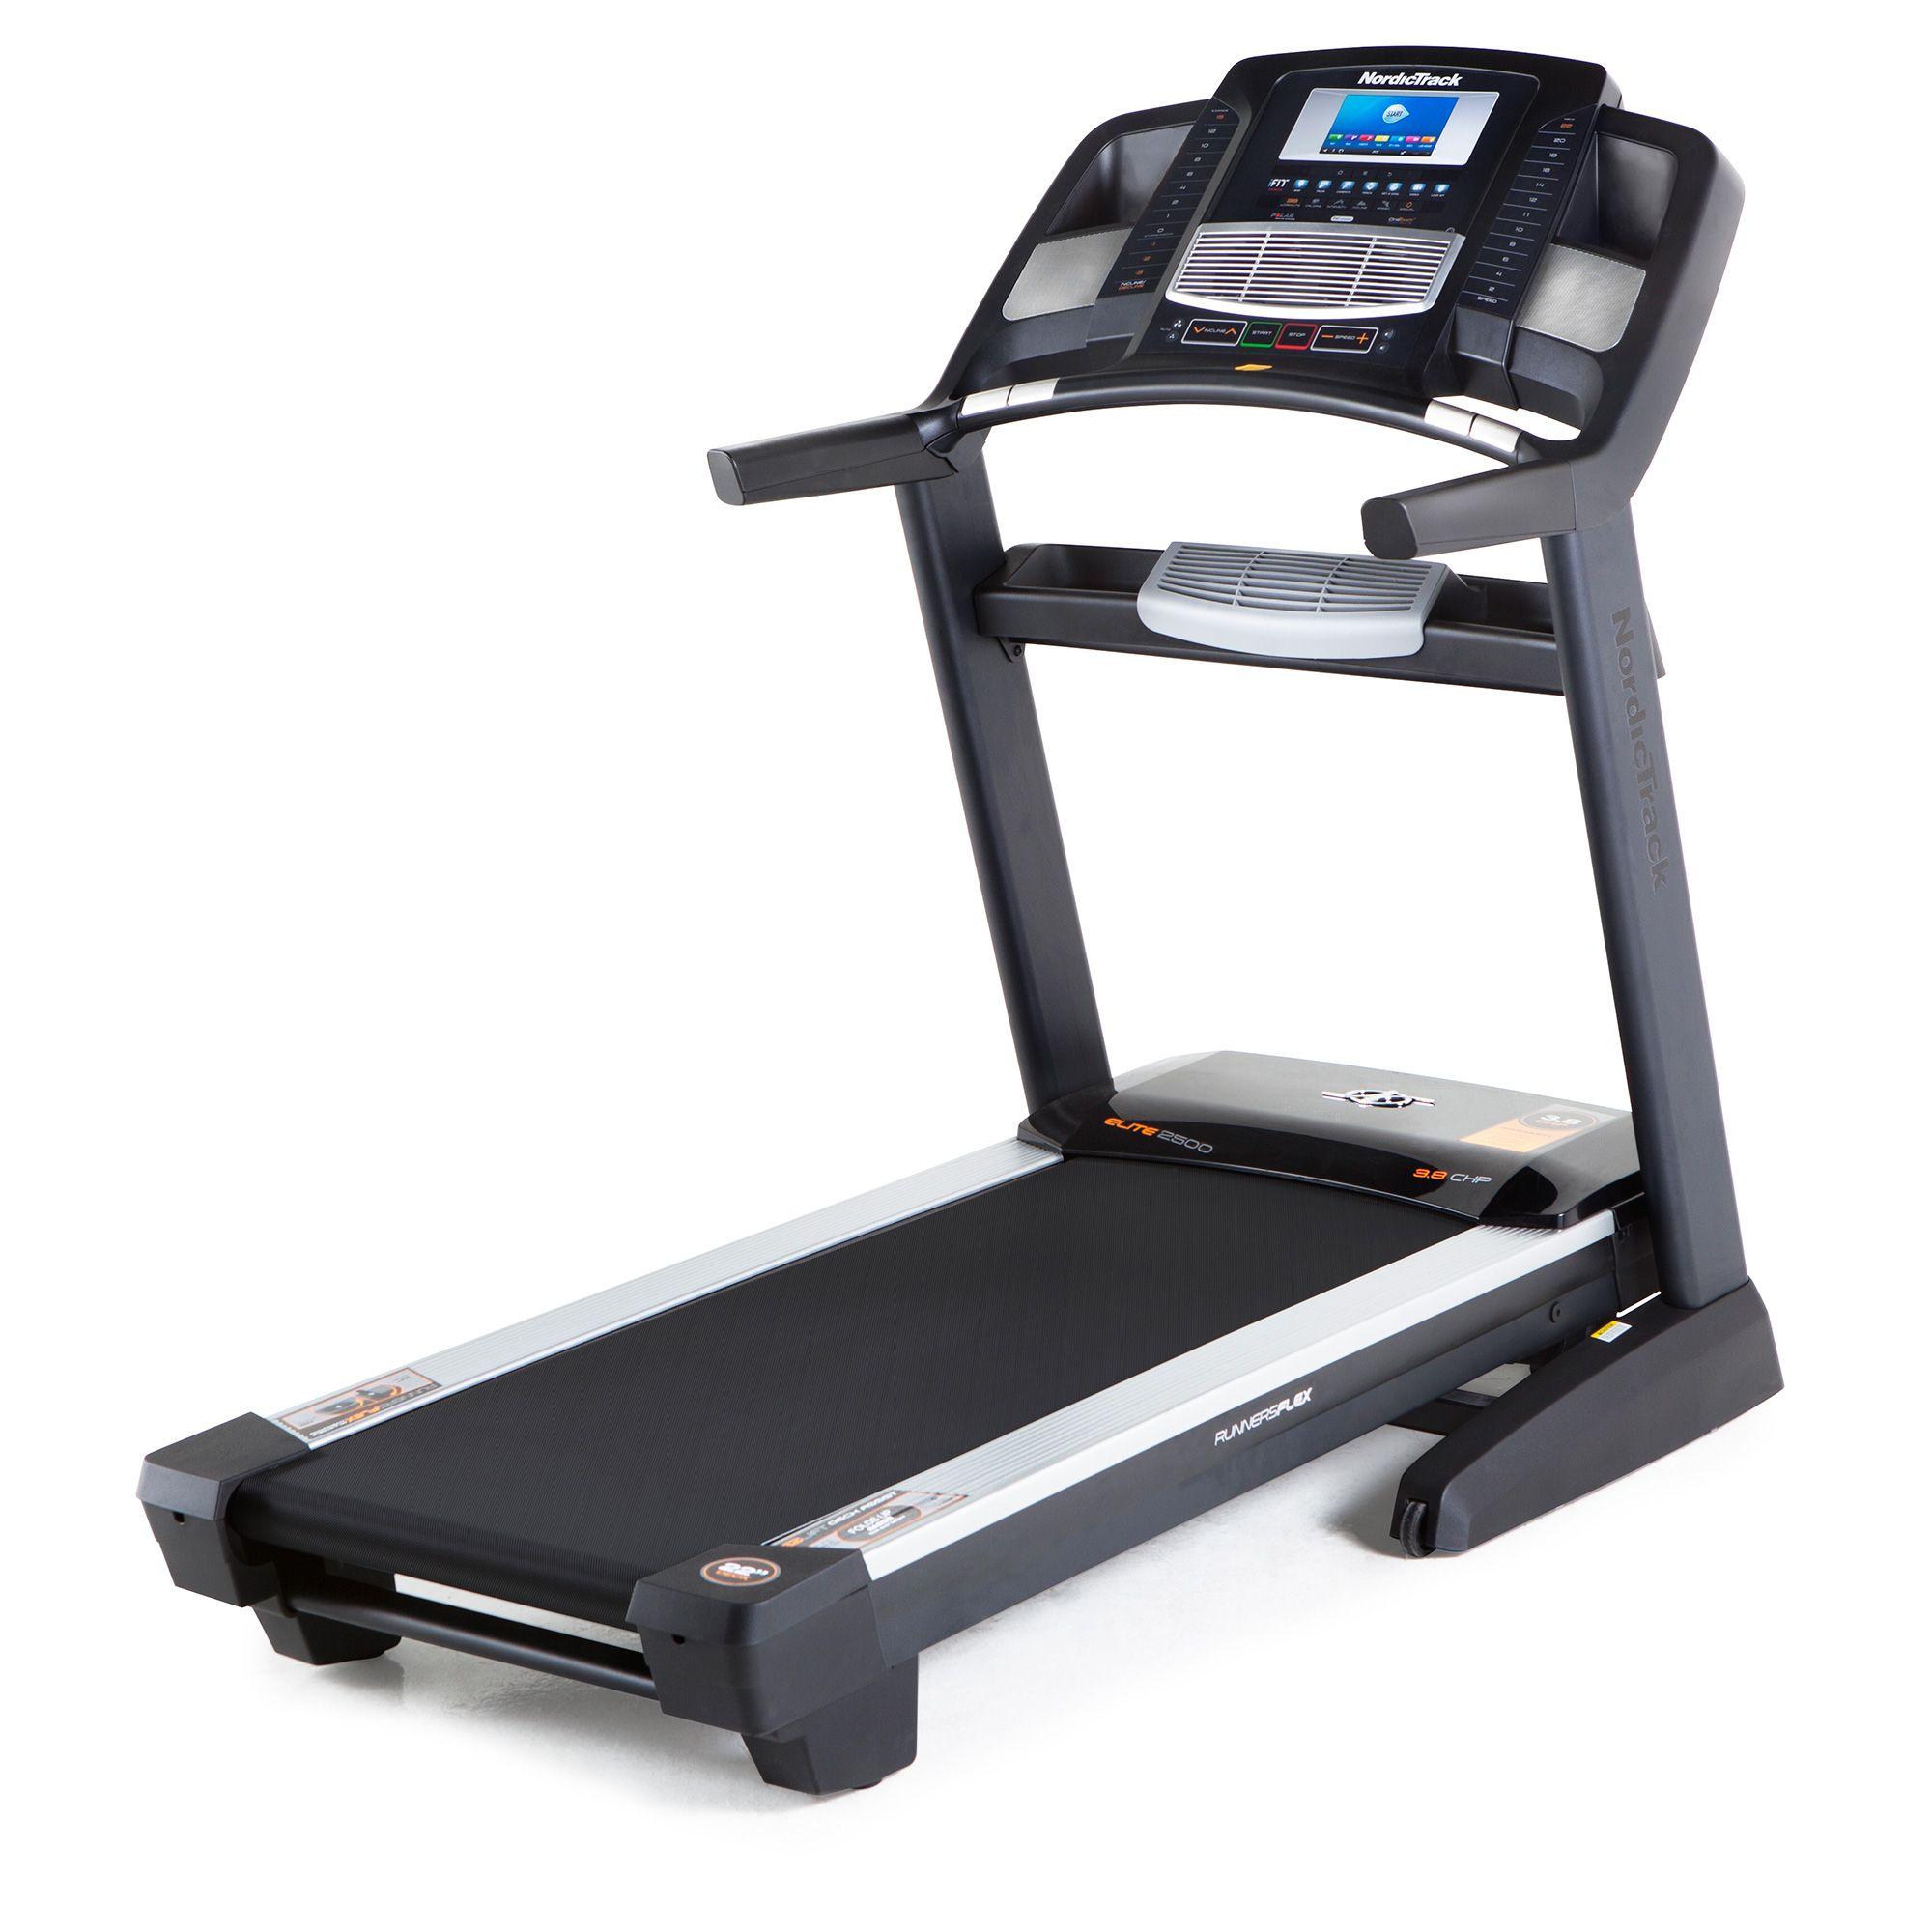 Sole Treadmill Order Tracking: NordicTrack Elite 2500 Treadmill